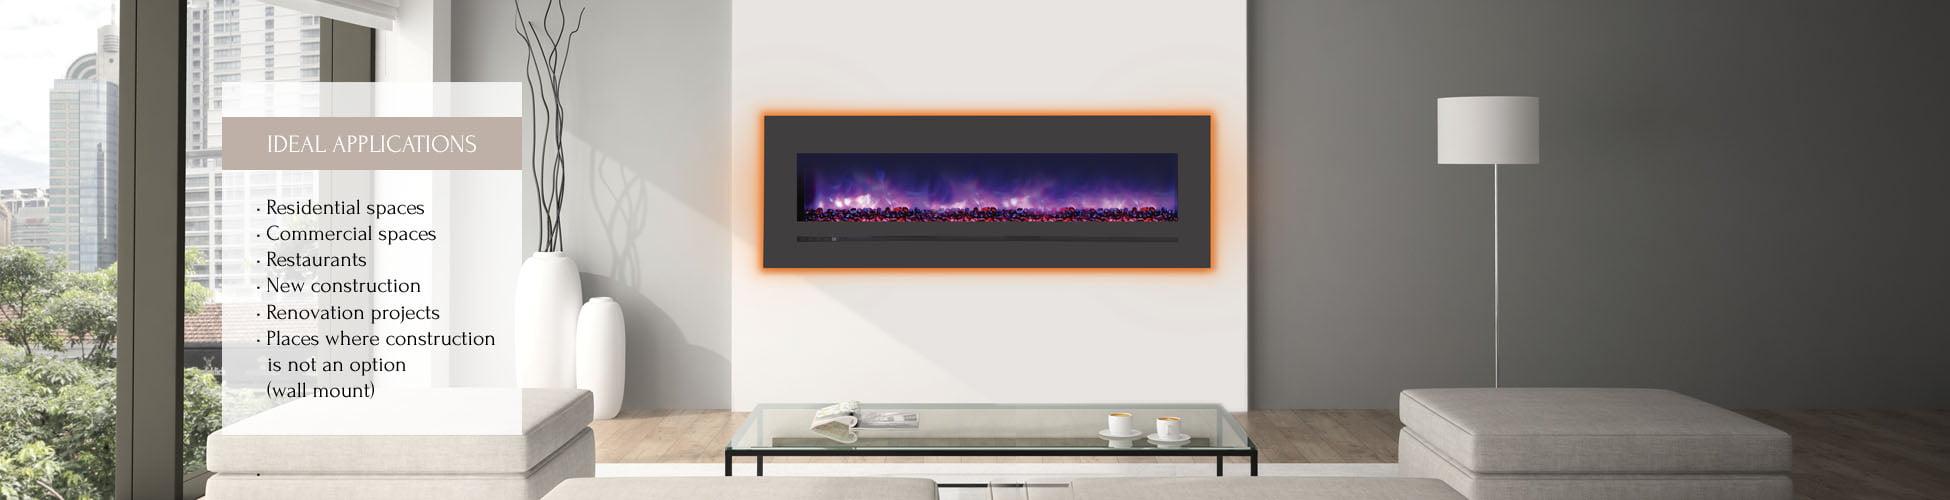 WM-FML-60-6623-STL electric fireplace